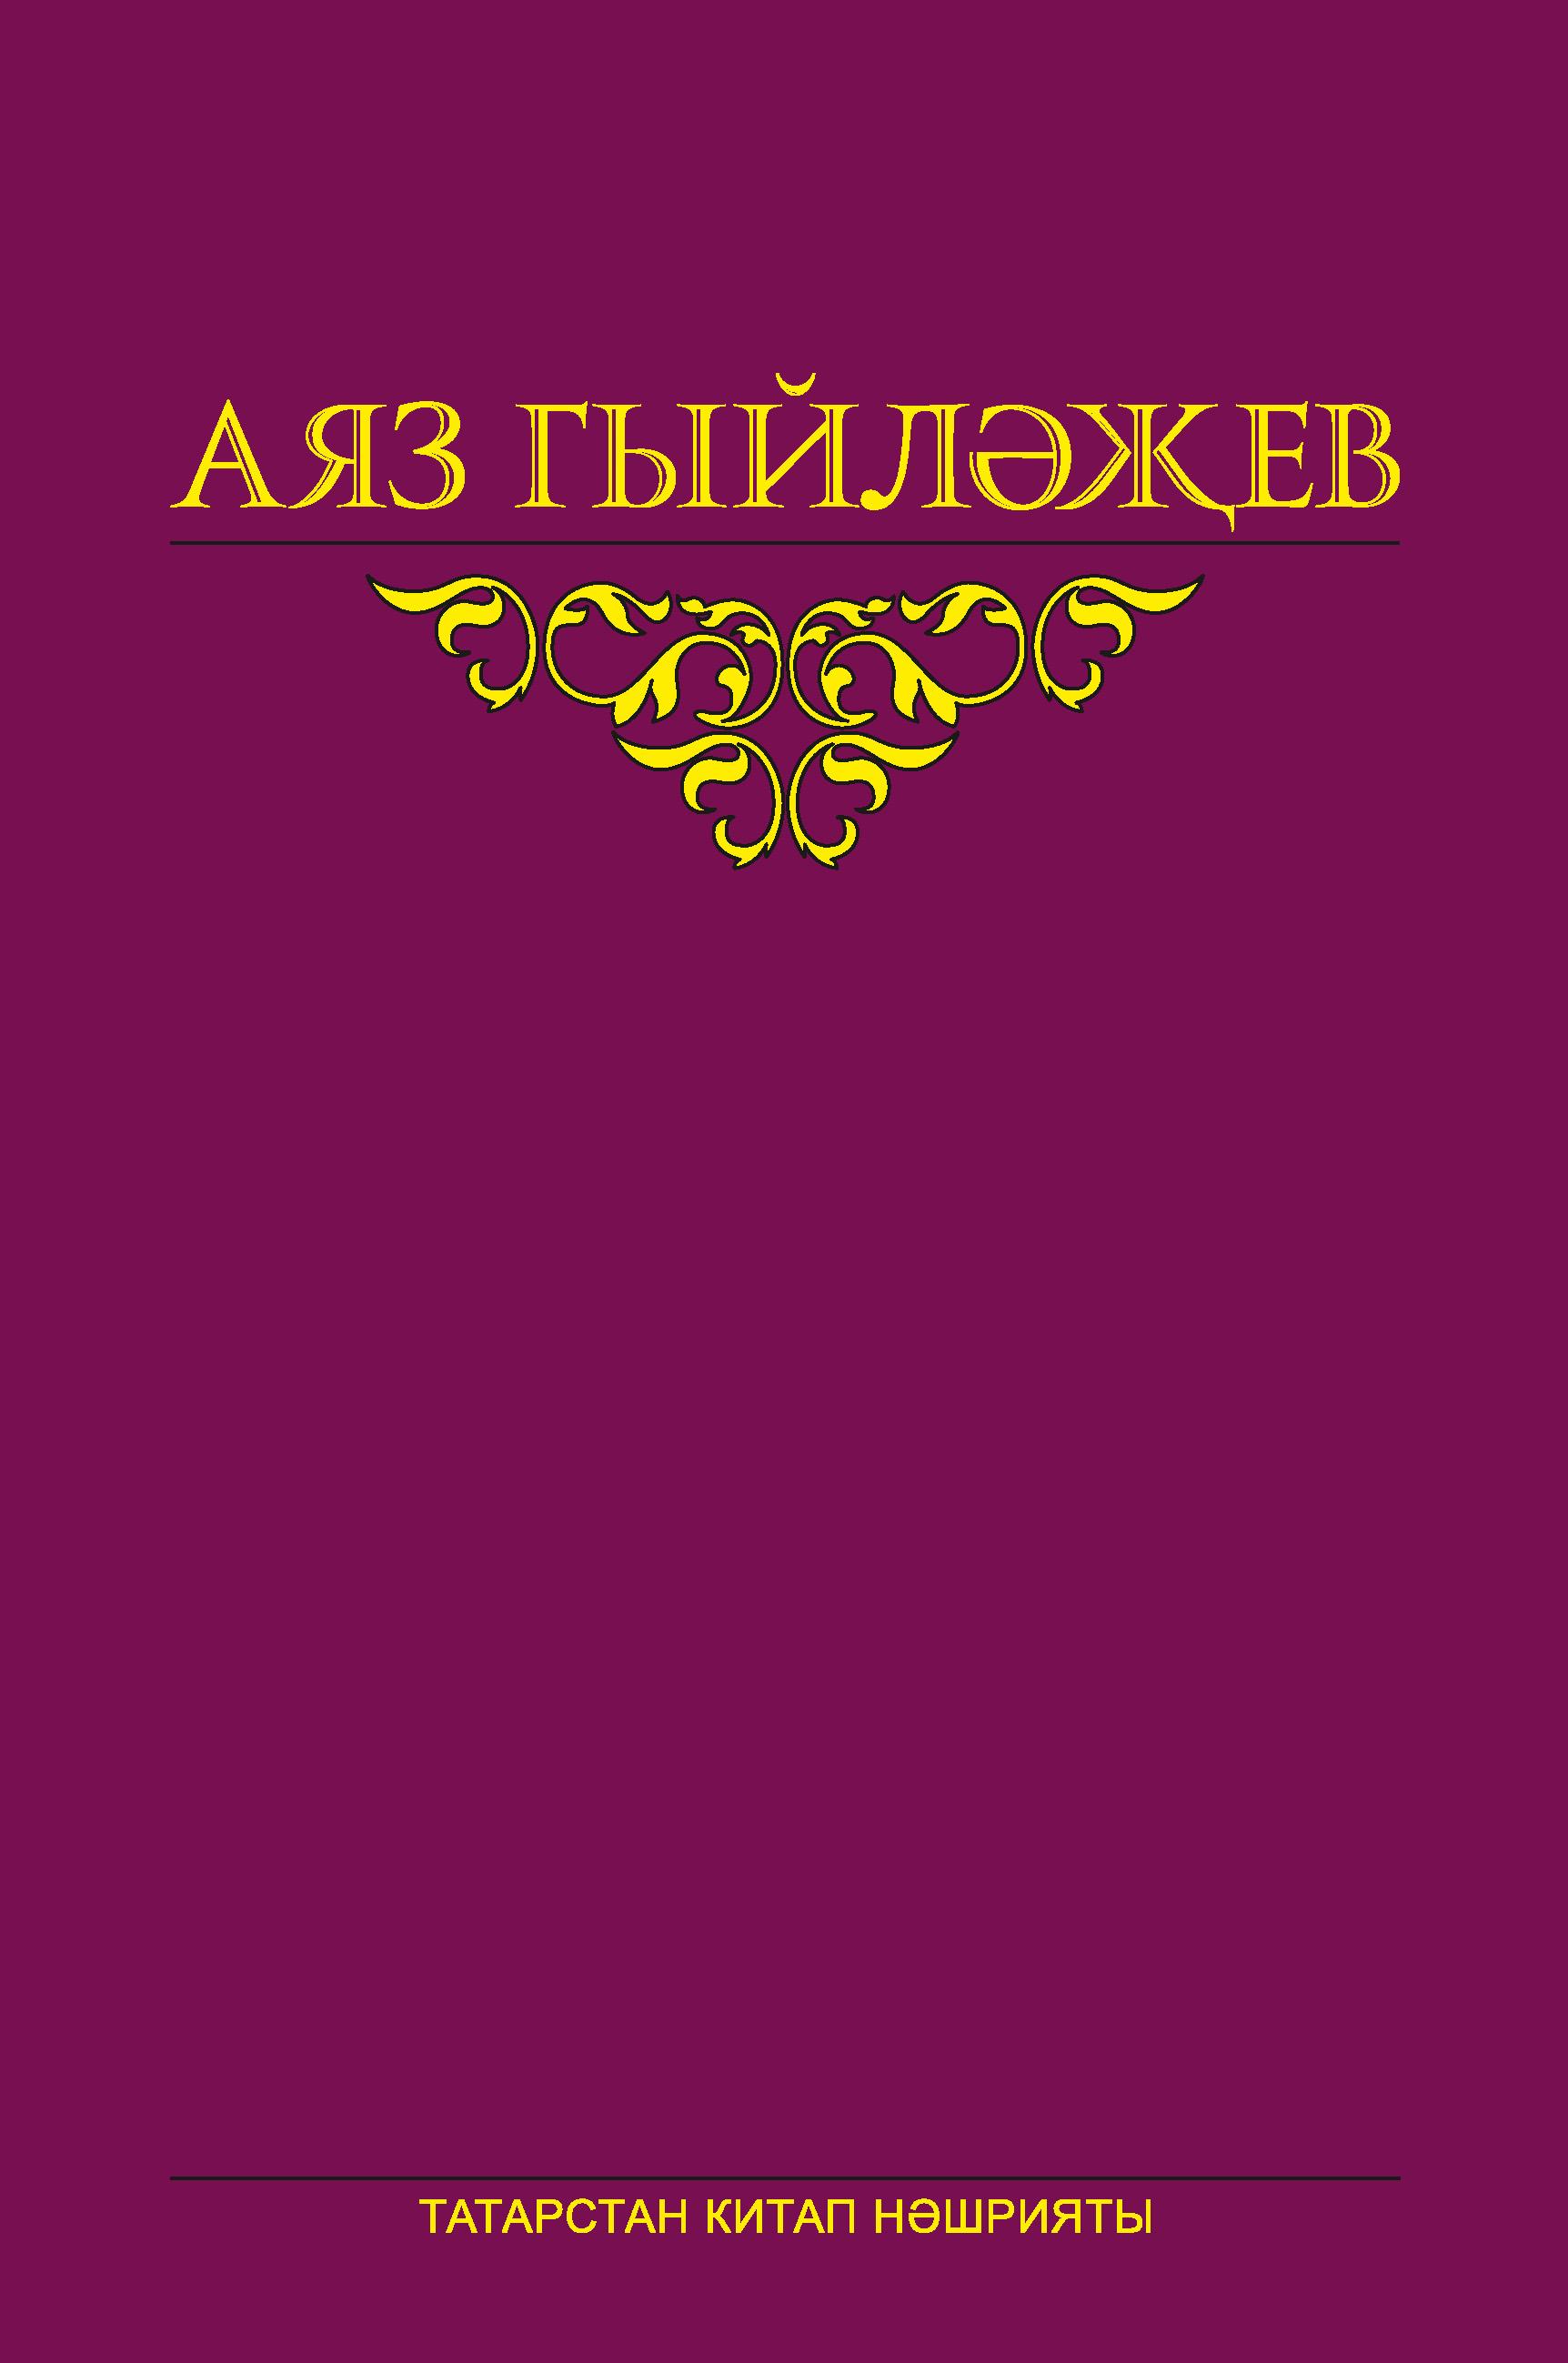 Сайланма әсәрләр. 4 том. Повесть, хикәяләр, әдәби тәнкыйть мәкаләсе, көндәлекләр, хатлар